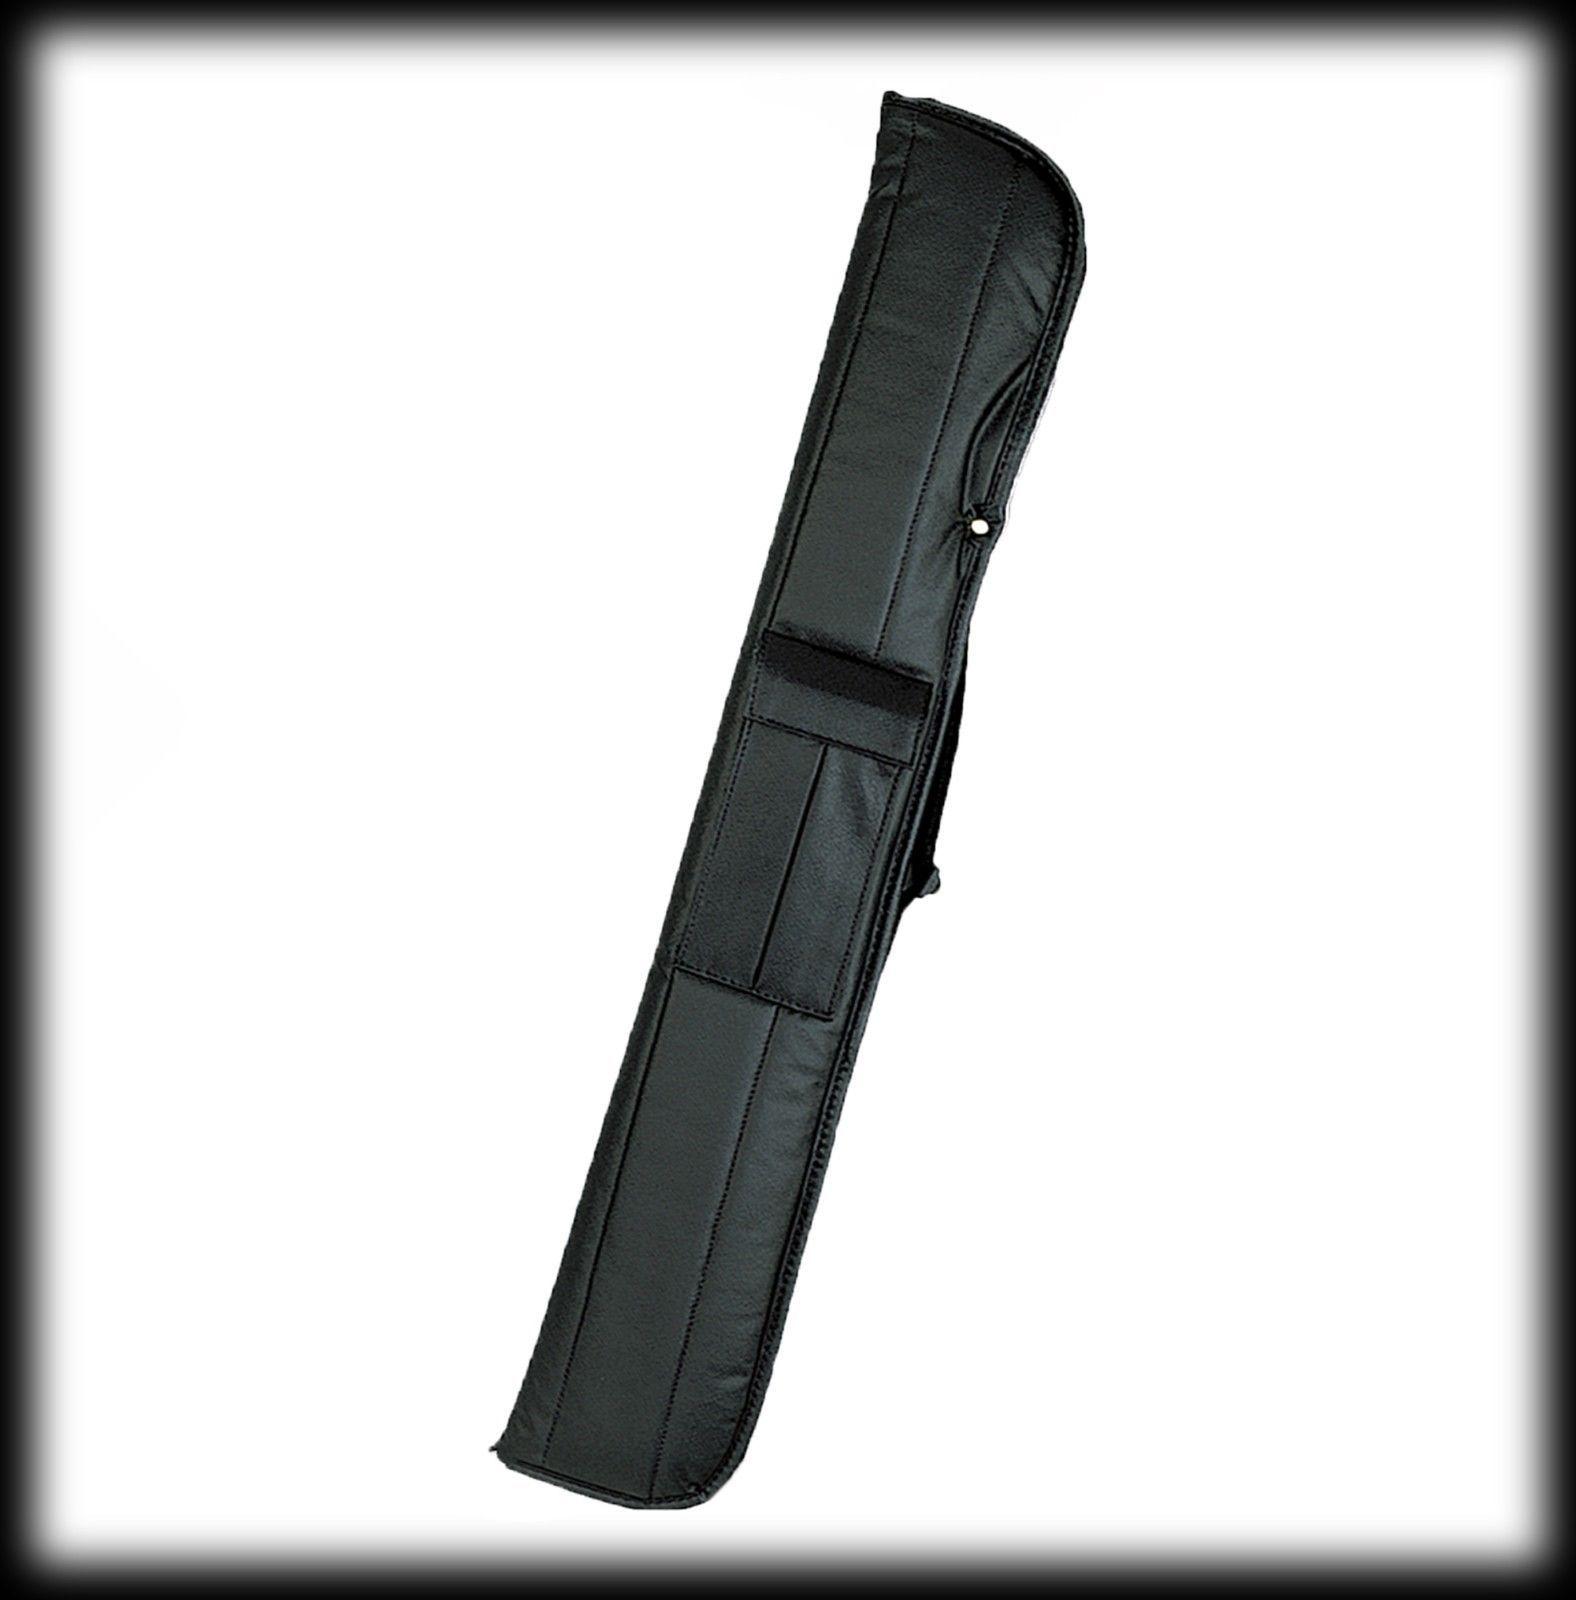 New Athena ATH29 Pool Cue Stick Zebra w/Pink & Black Linen Wrap 17-21 oz & Case